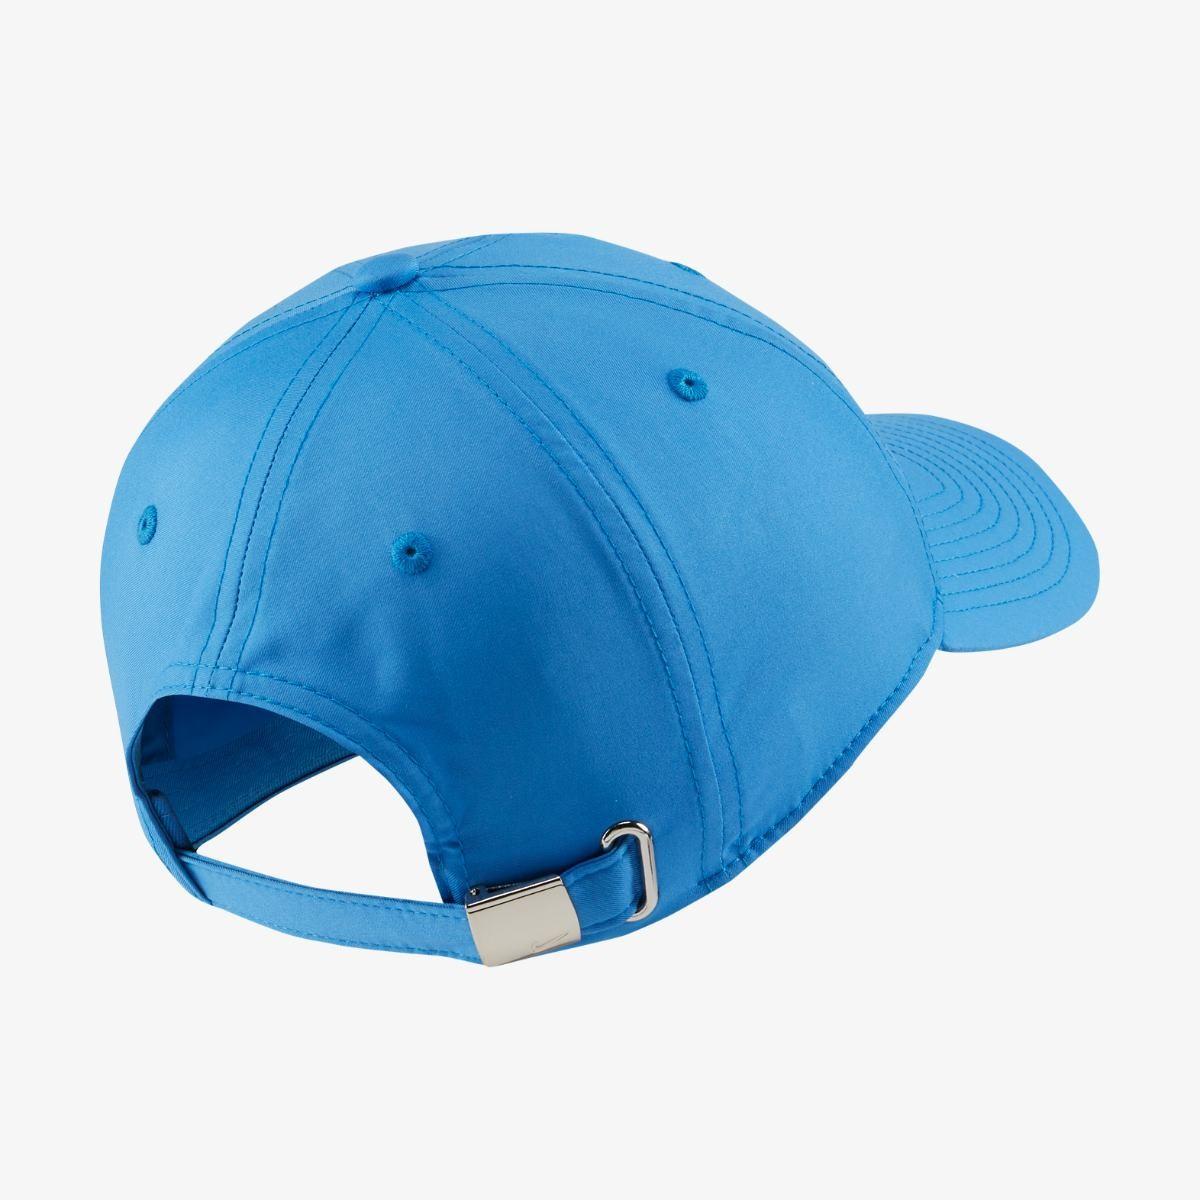 Теннисная кепка Nike H86 Metal Swoosh Cap pacific blue/metallic silver